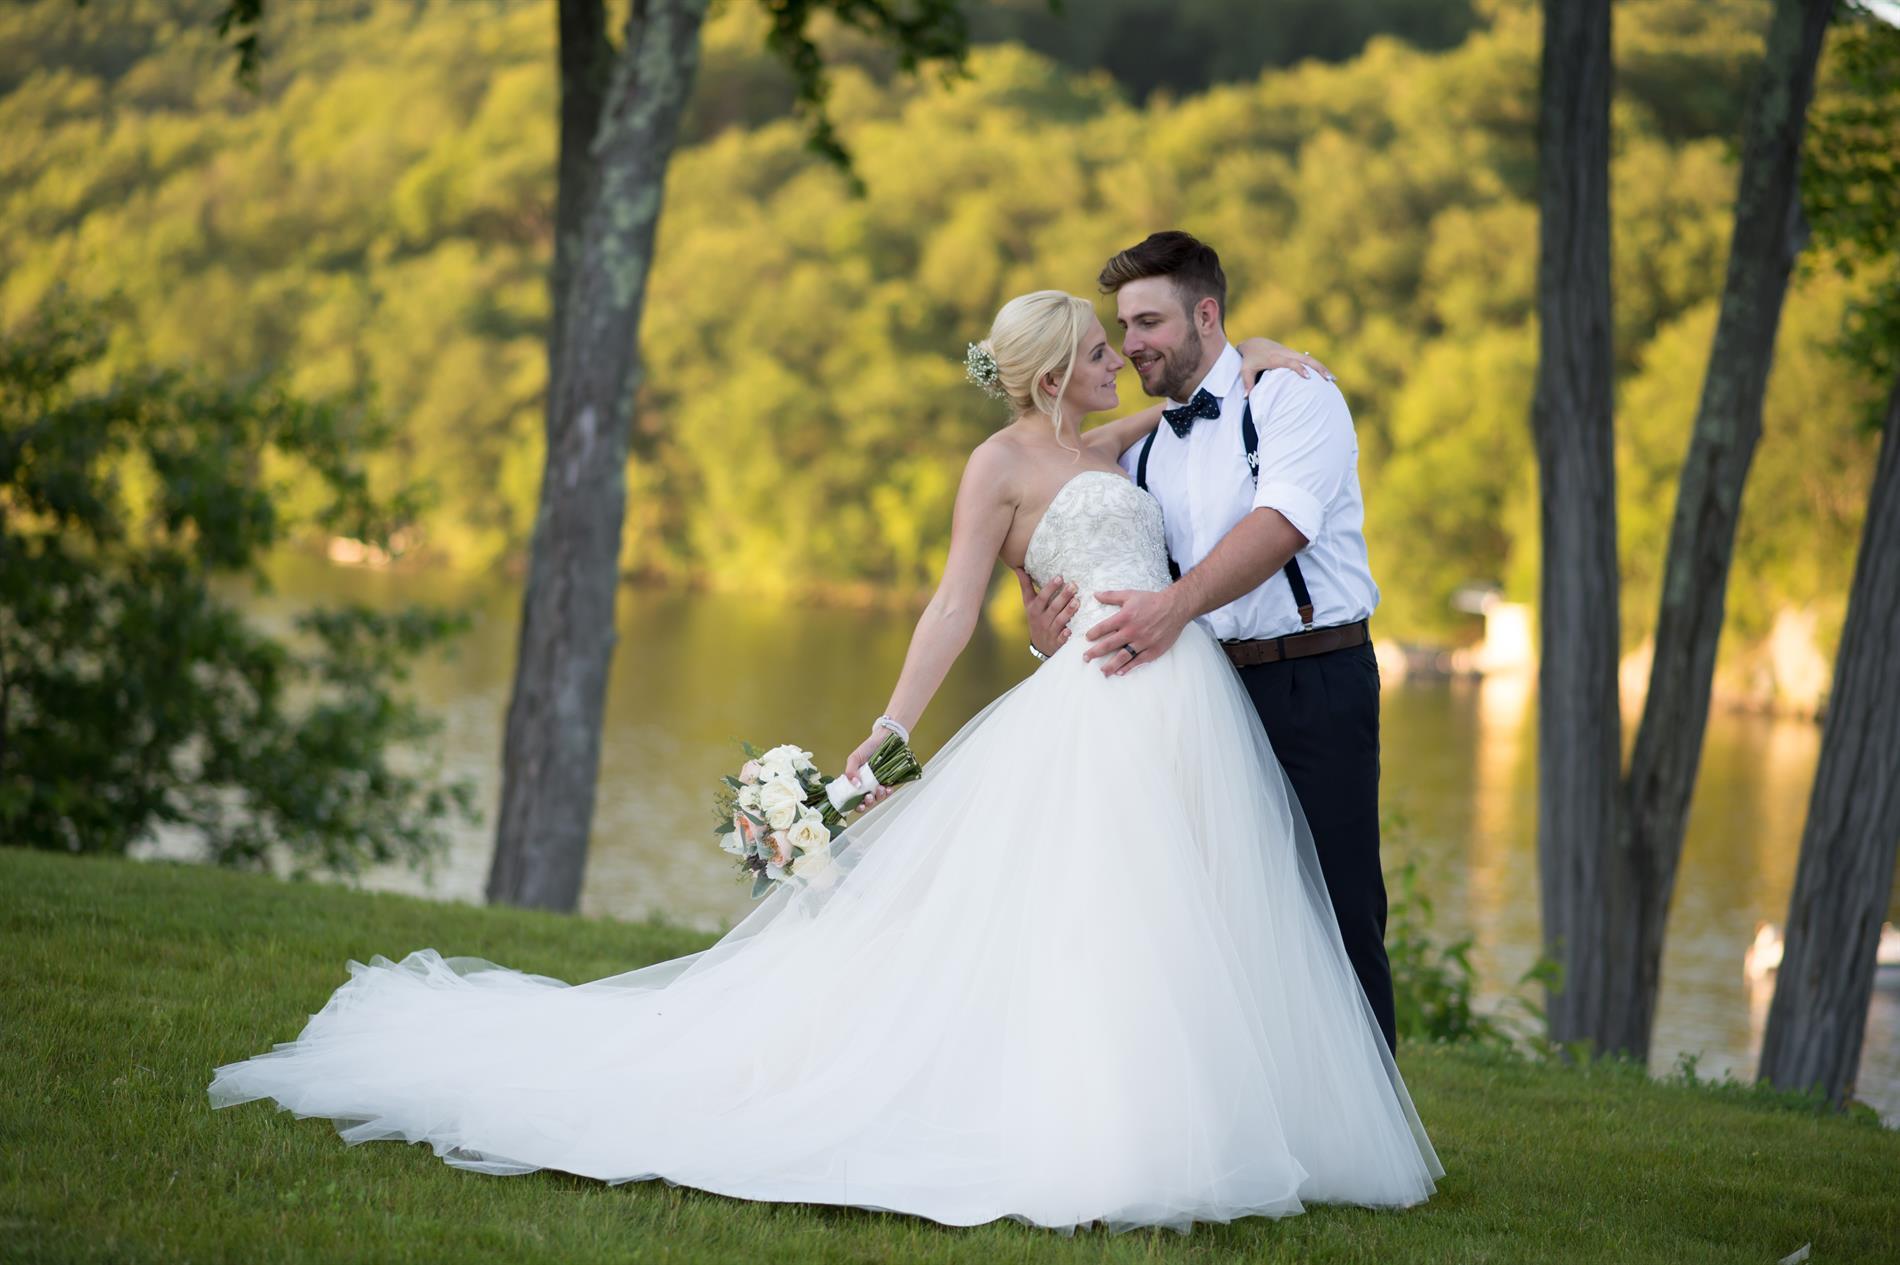 Alex & Laura Engagement & Wedding Photos